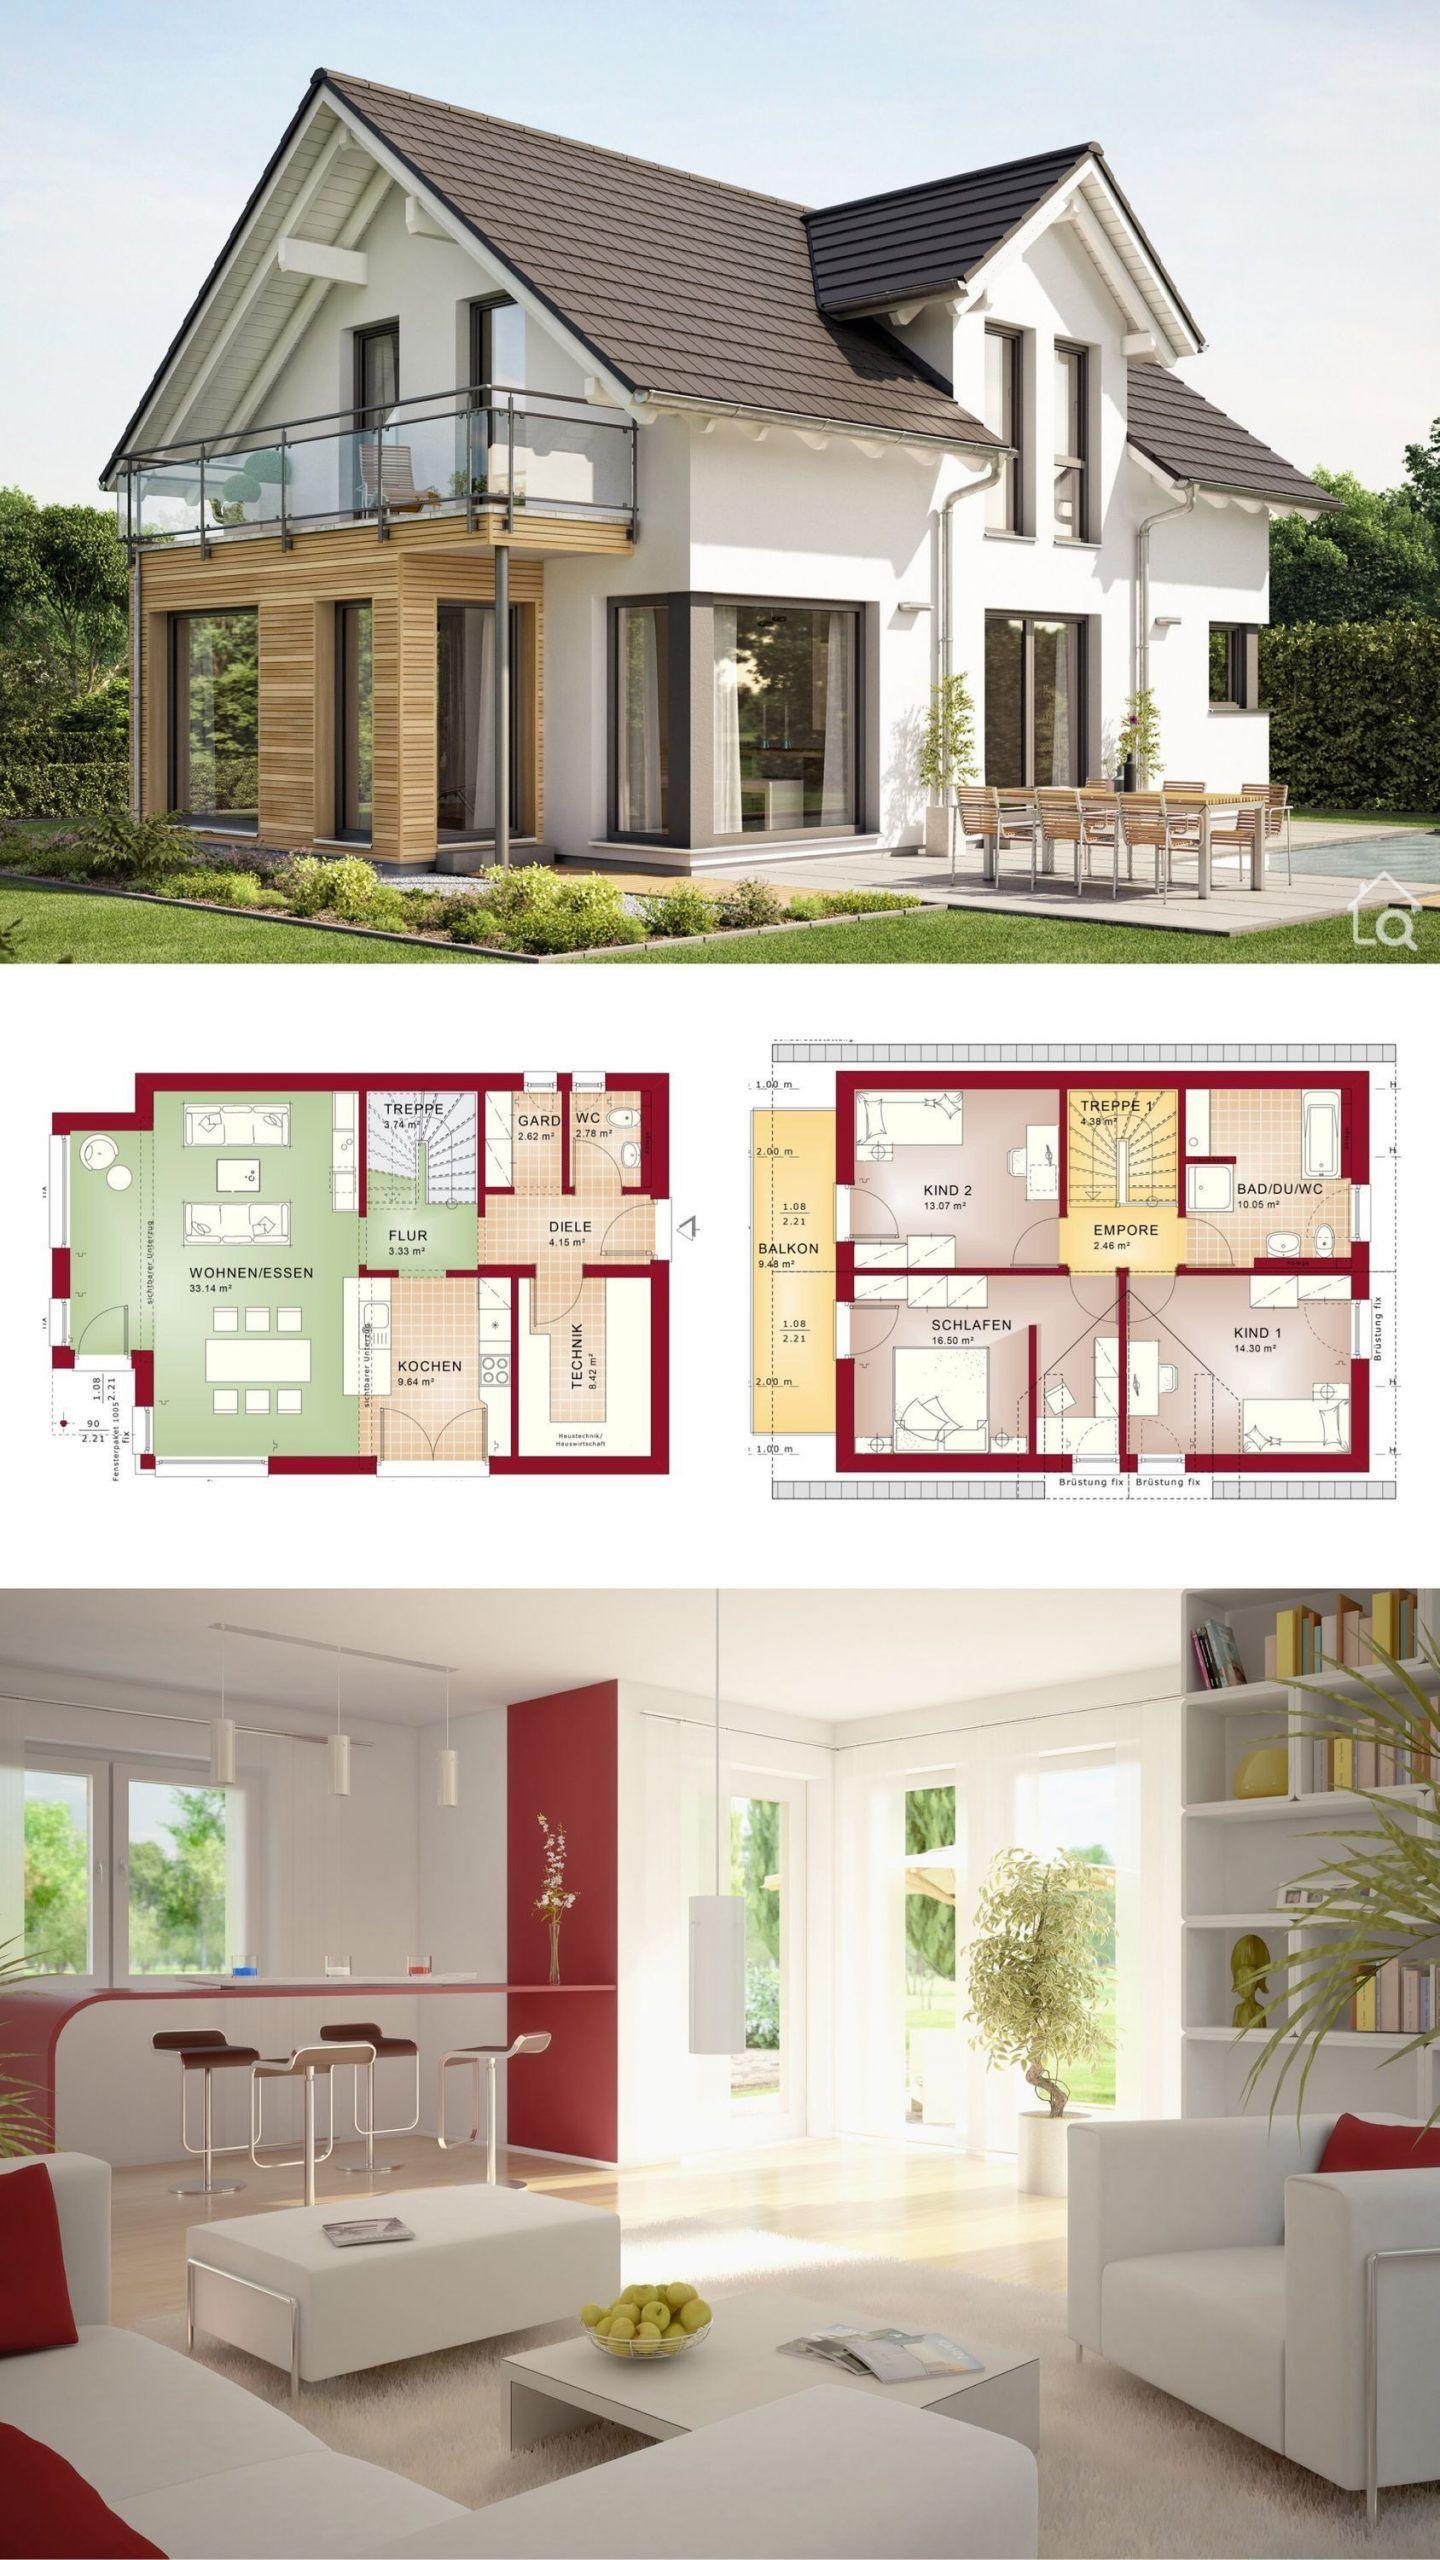 European Modern House Plans E Family House Plans 2 Story 3 Bedroom Modern European House Architecture Design Prefabricated Houses Family House Plans